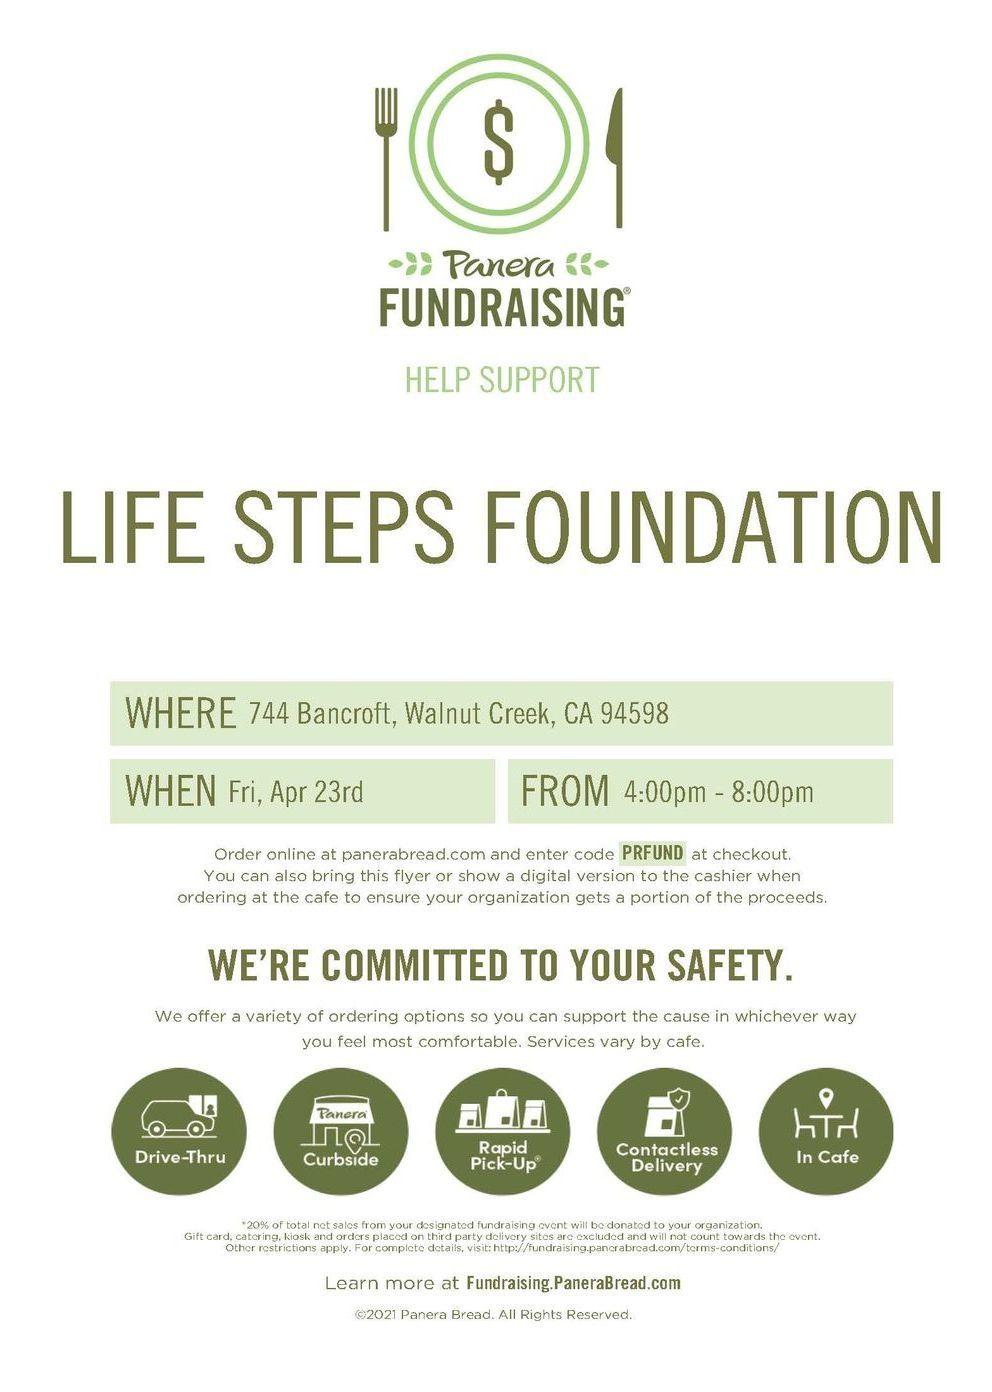 Panera Bread Fundraiser at Walnut Creek, CA - April 23, 2021